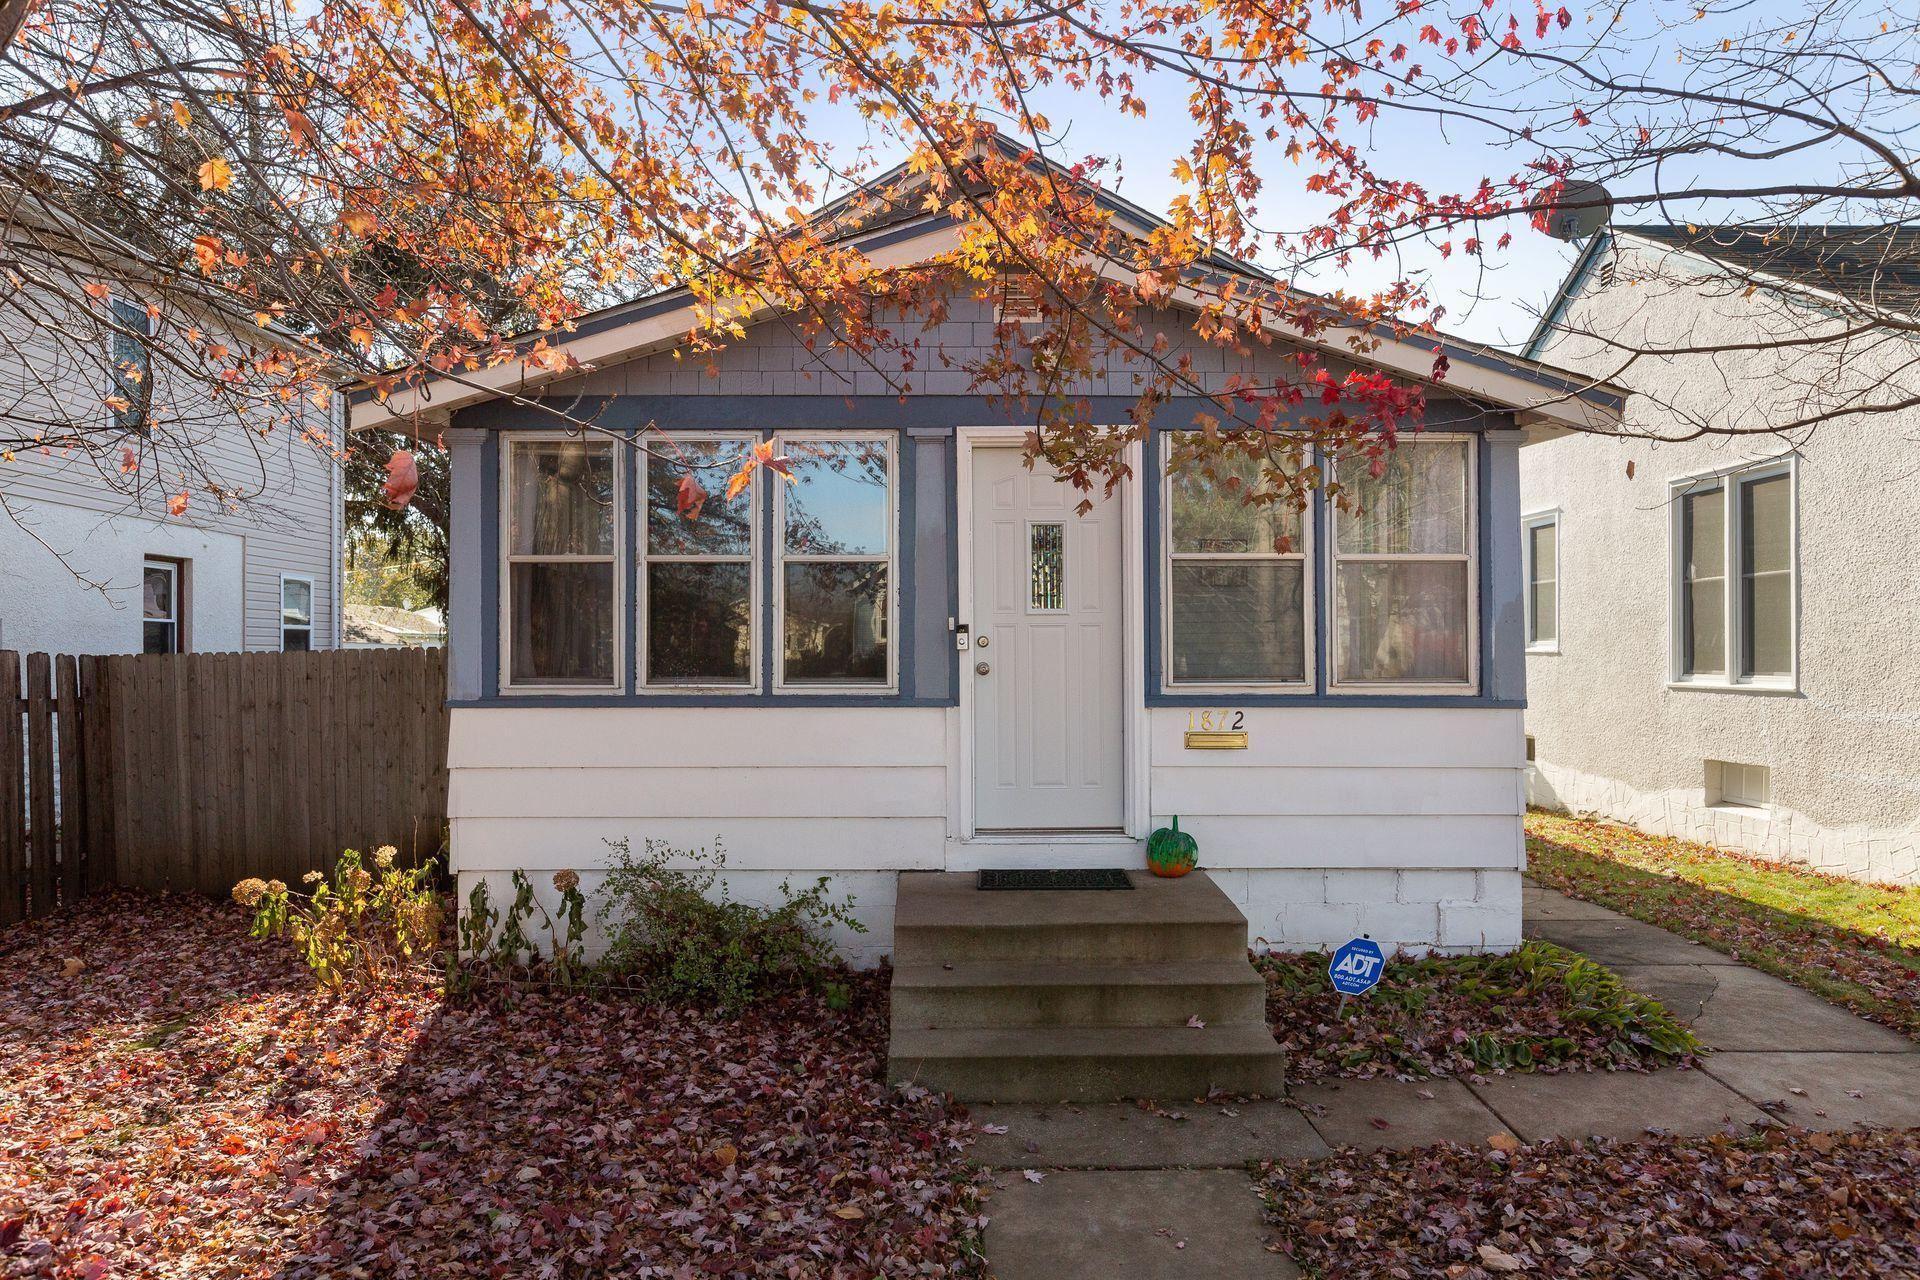 1872 Reaney Avenue E, Saint Paul, MN 55119 - MLS#: 5676930